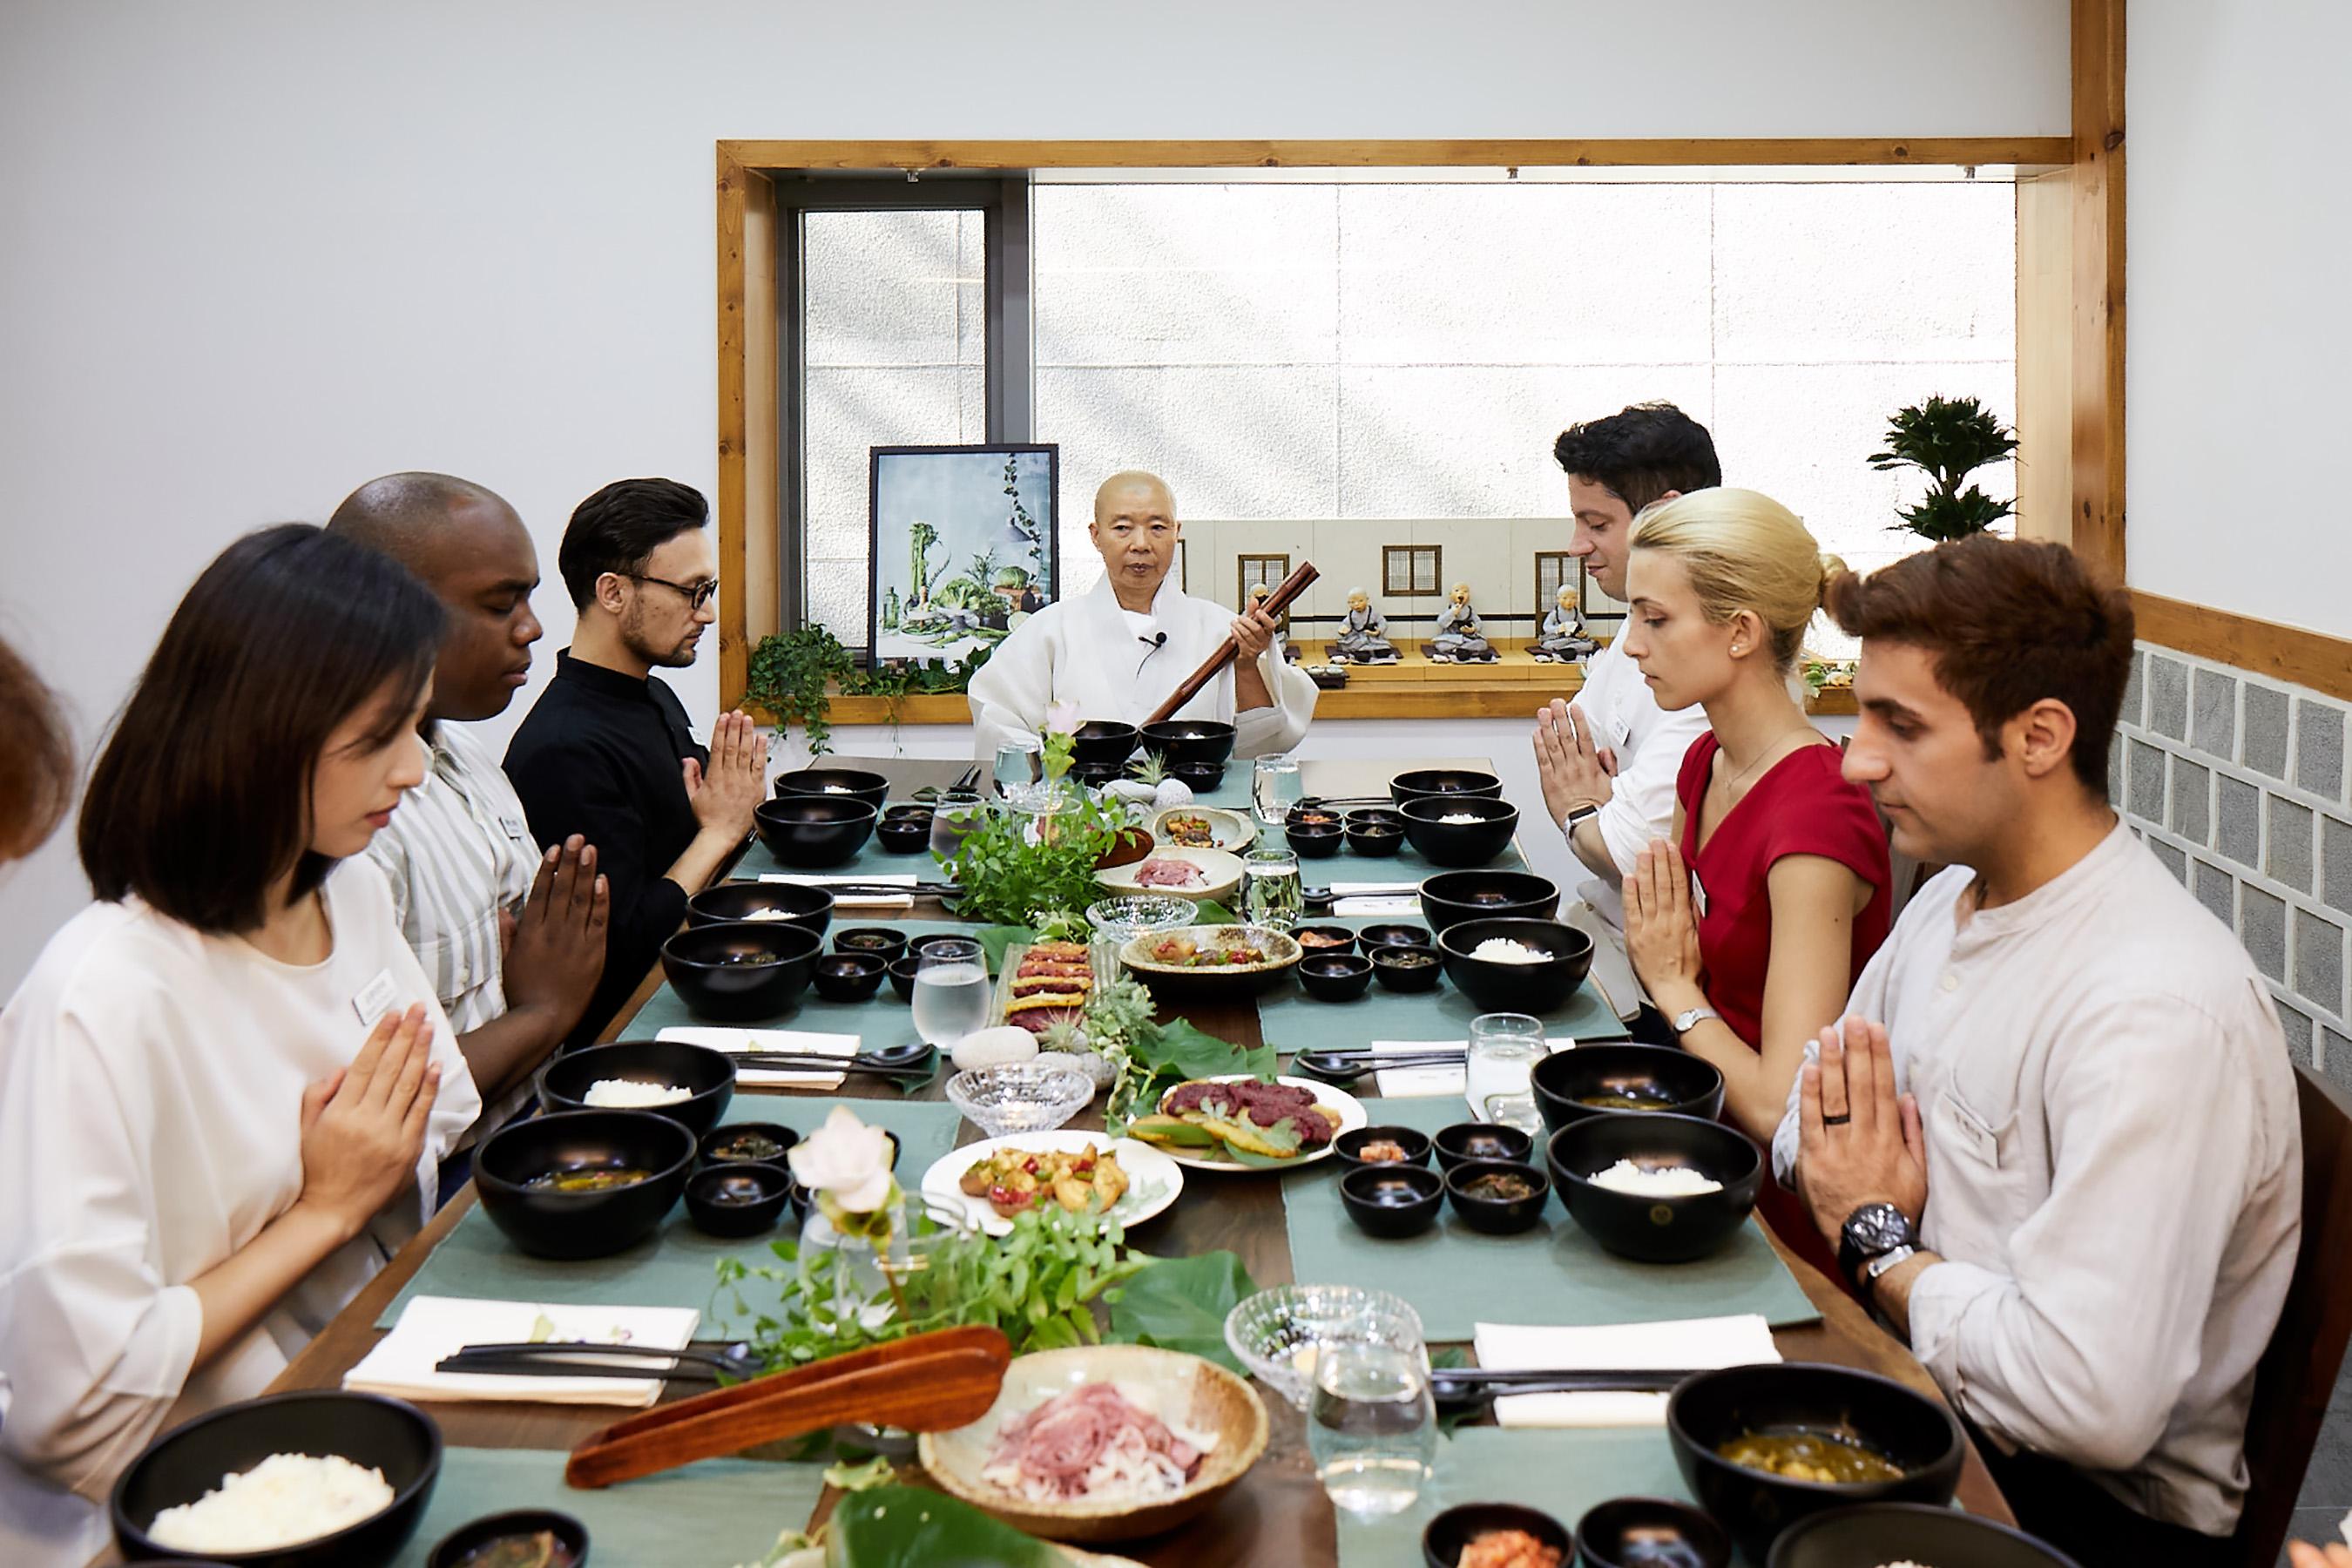 Experience of Baru Gongyang, The Korean Buddhist Monastic Meal Torino-Crocetta, Italy